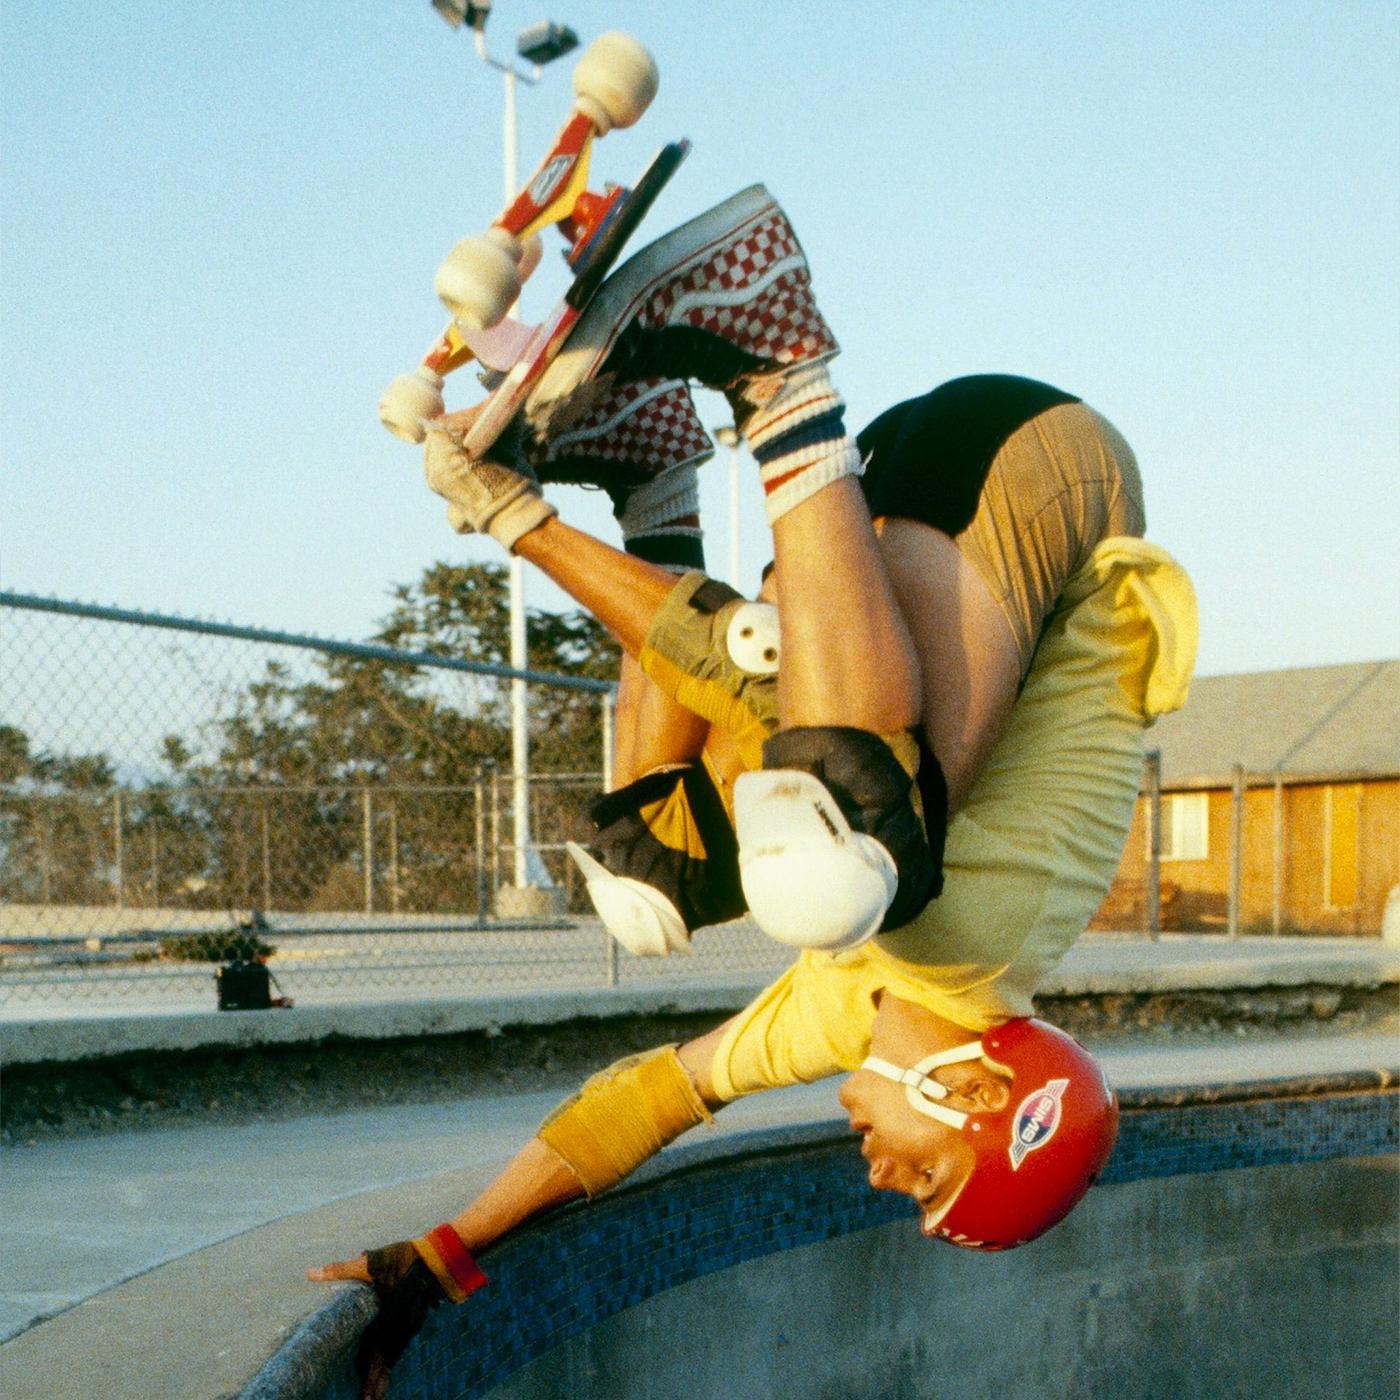 Floyd Valise Travel Case Skateboarding Culture